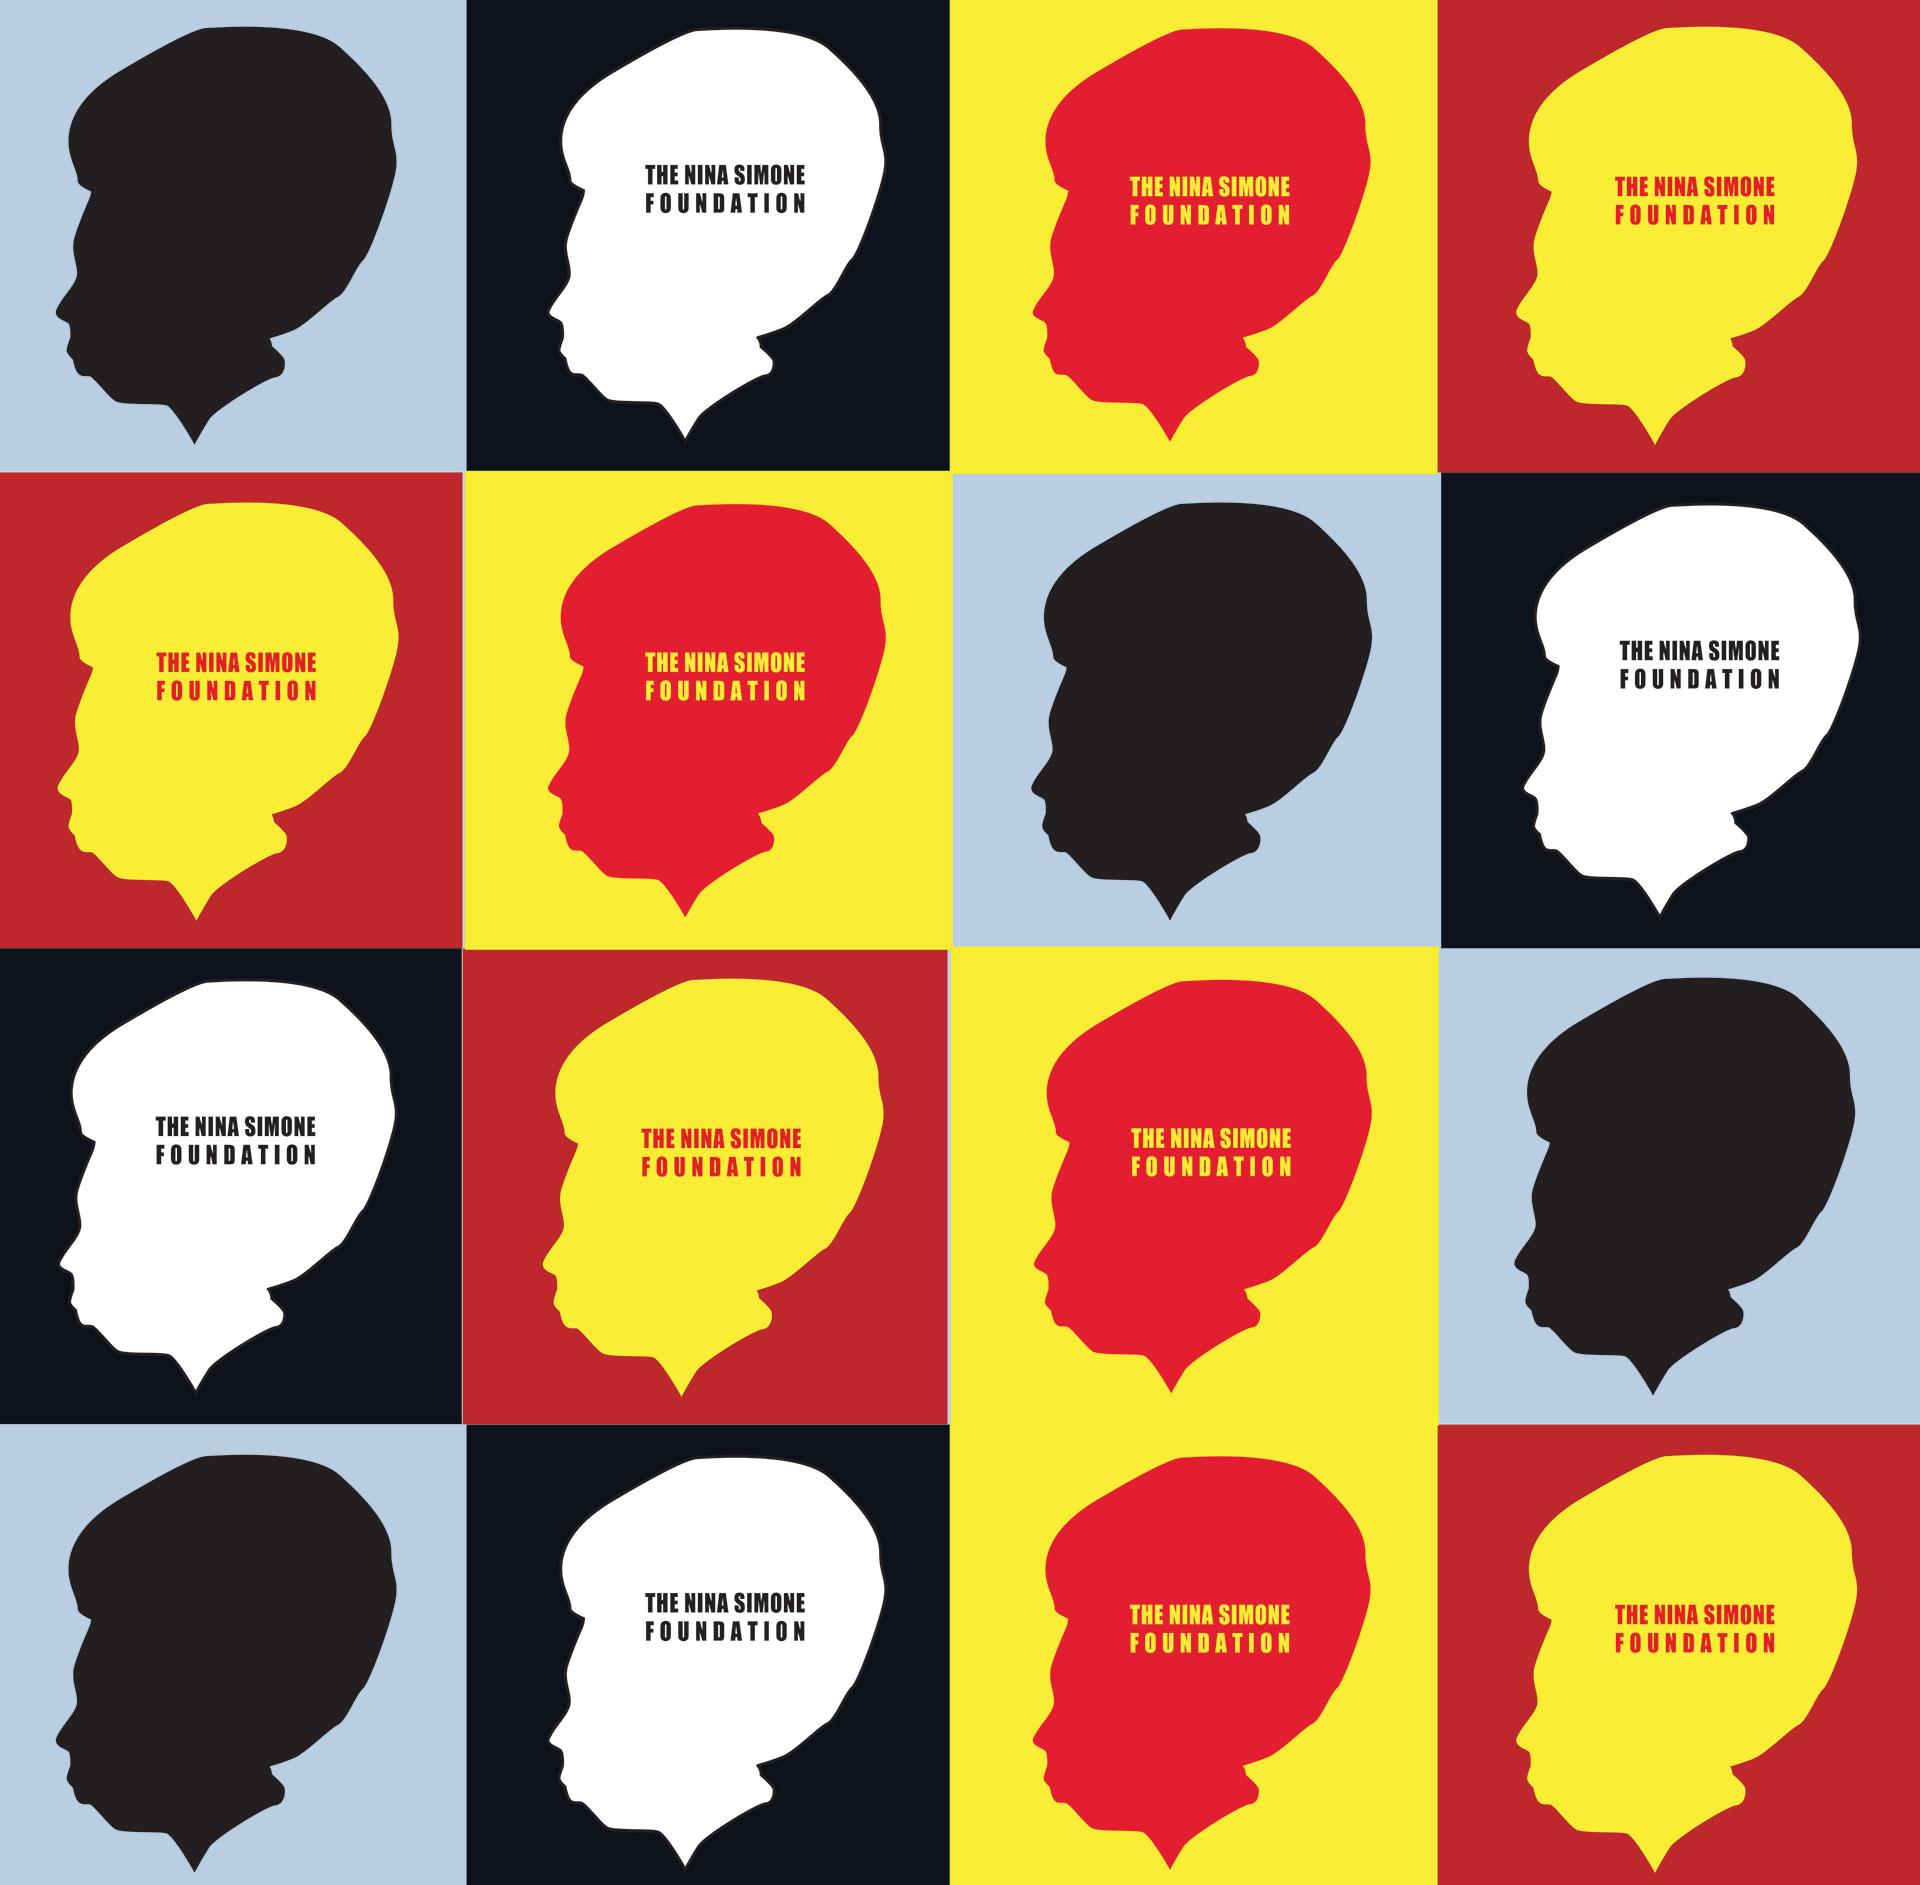 notfromhere-nina-simone-foundation-logo-design fun colors for logo